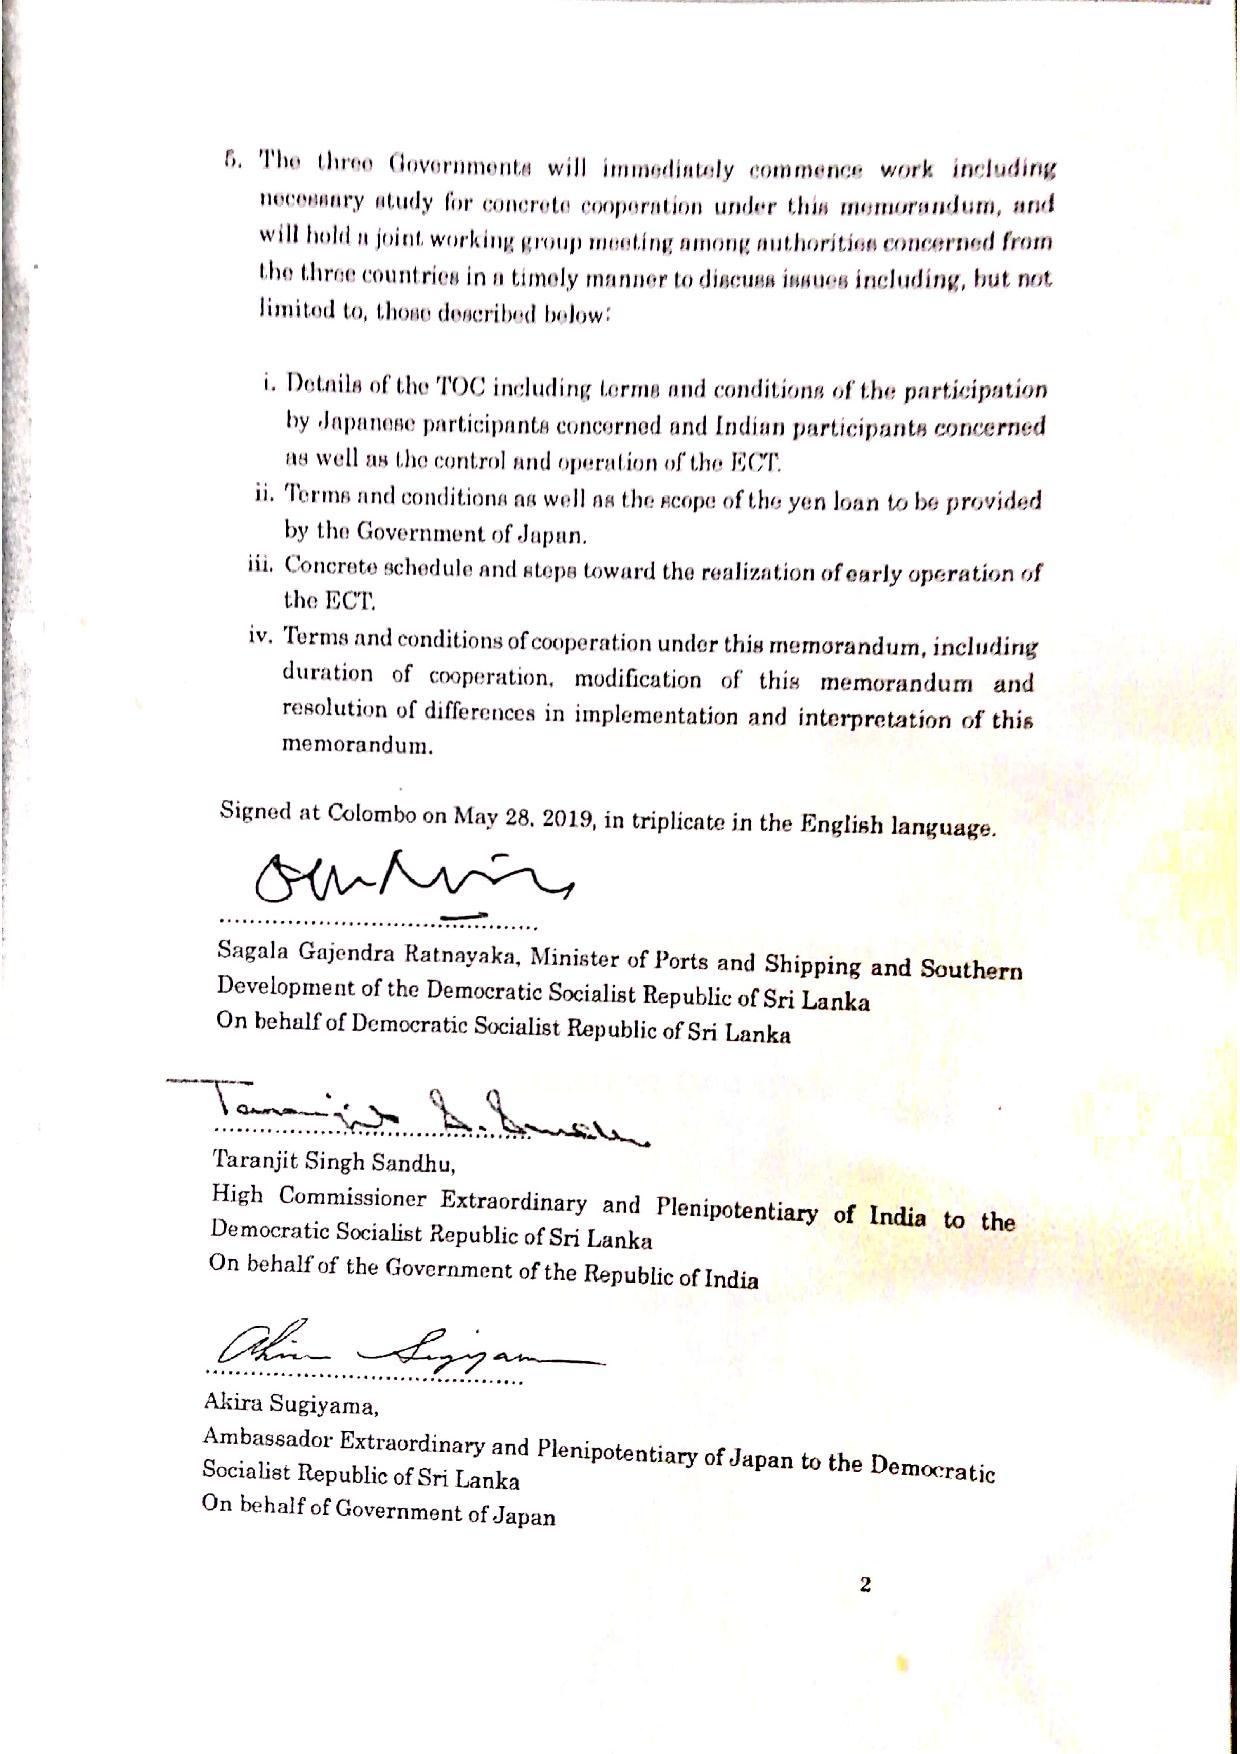 May 2019 Sri Lanka Cabinet Memo p.3